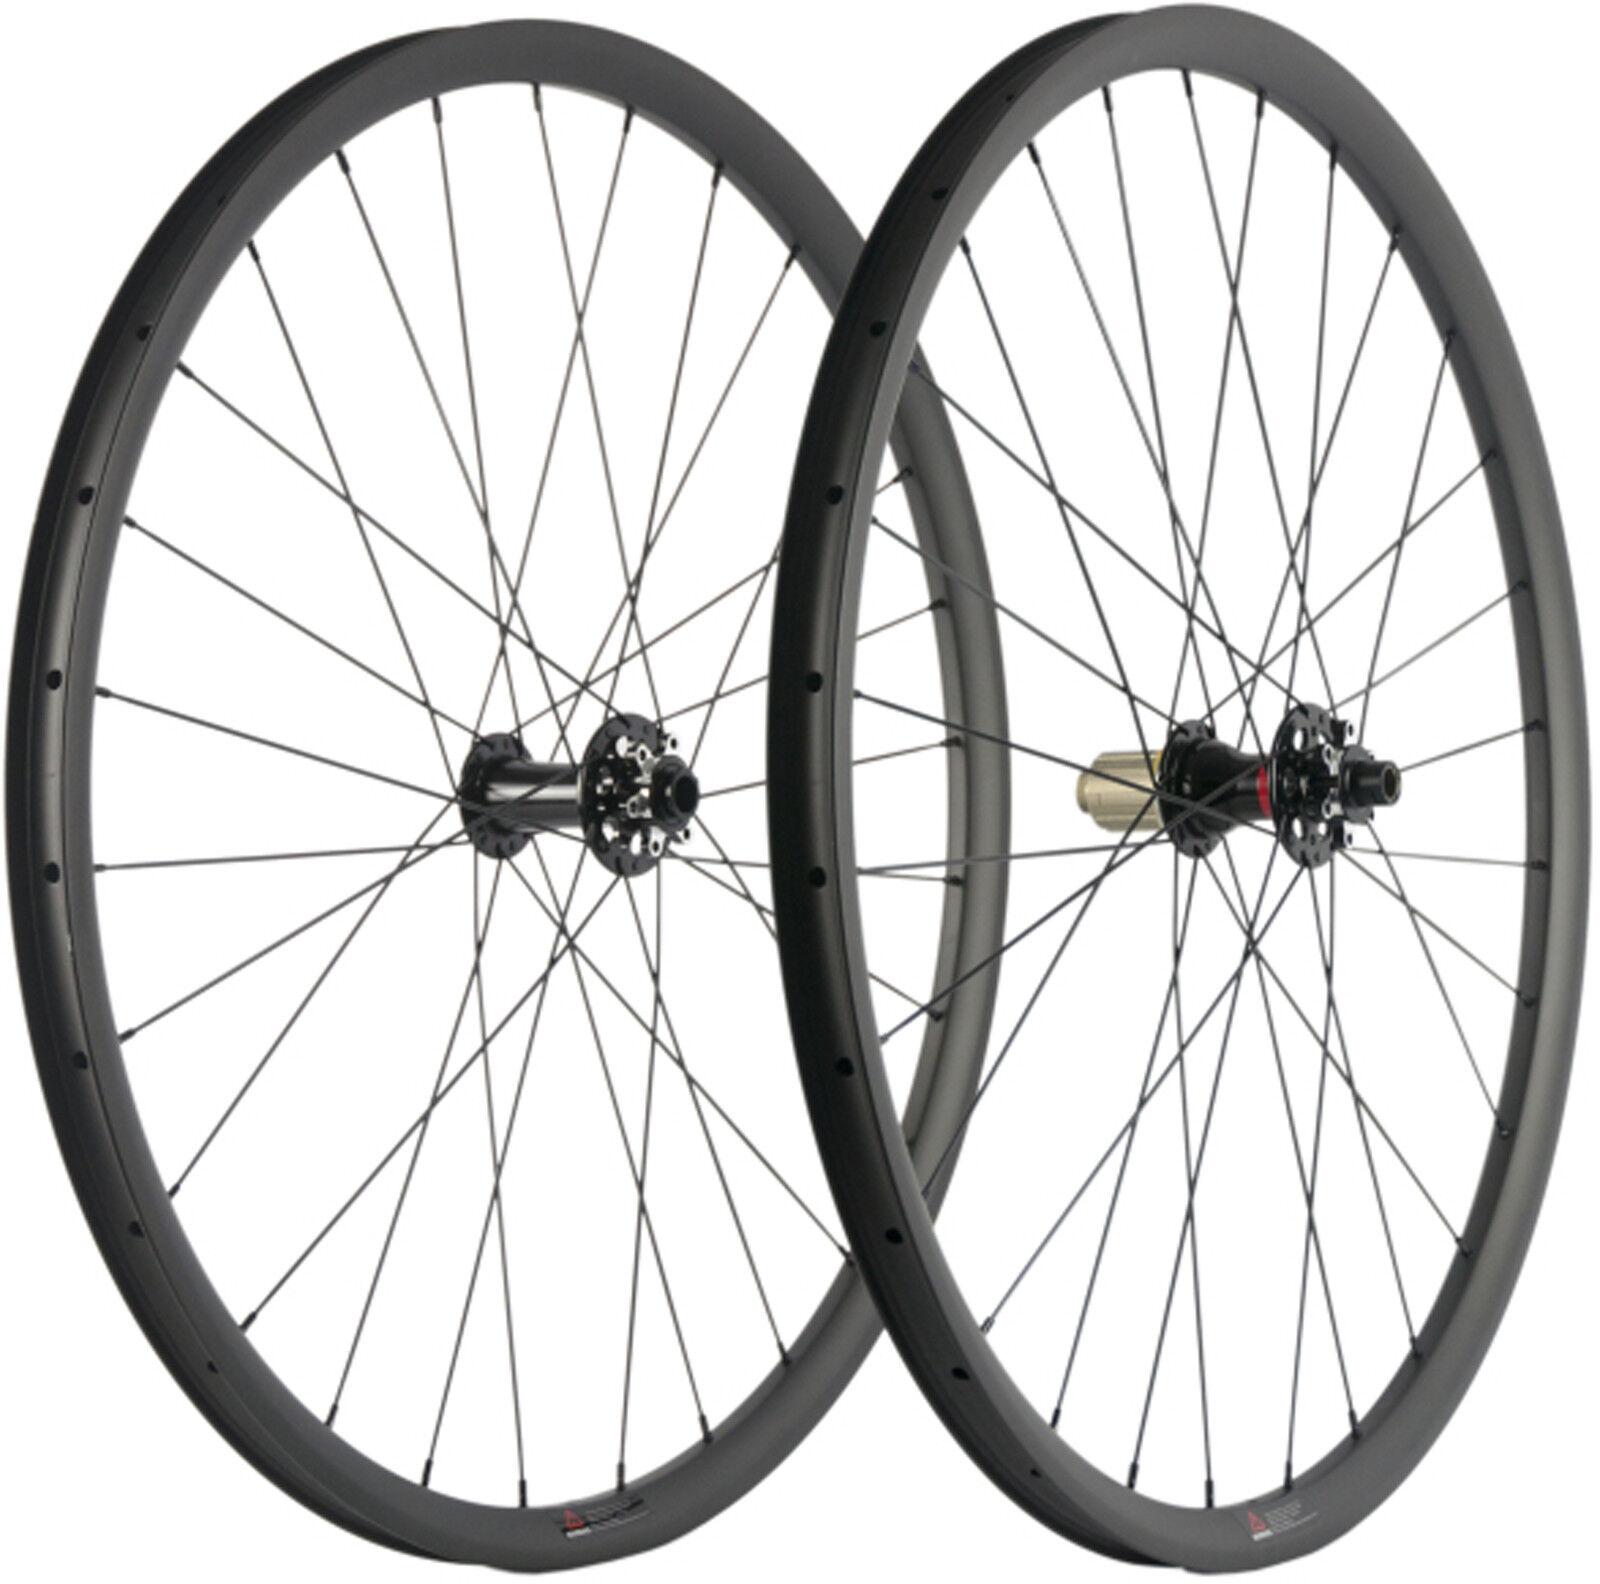 MTB Mountain Cykel 27.5  29ER Carbon Wheelset Mountain Cykel 6 Bolt Axle 142 12mm